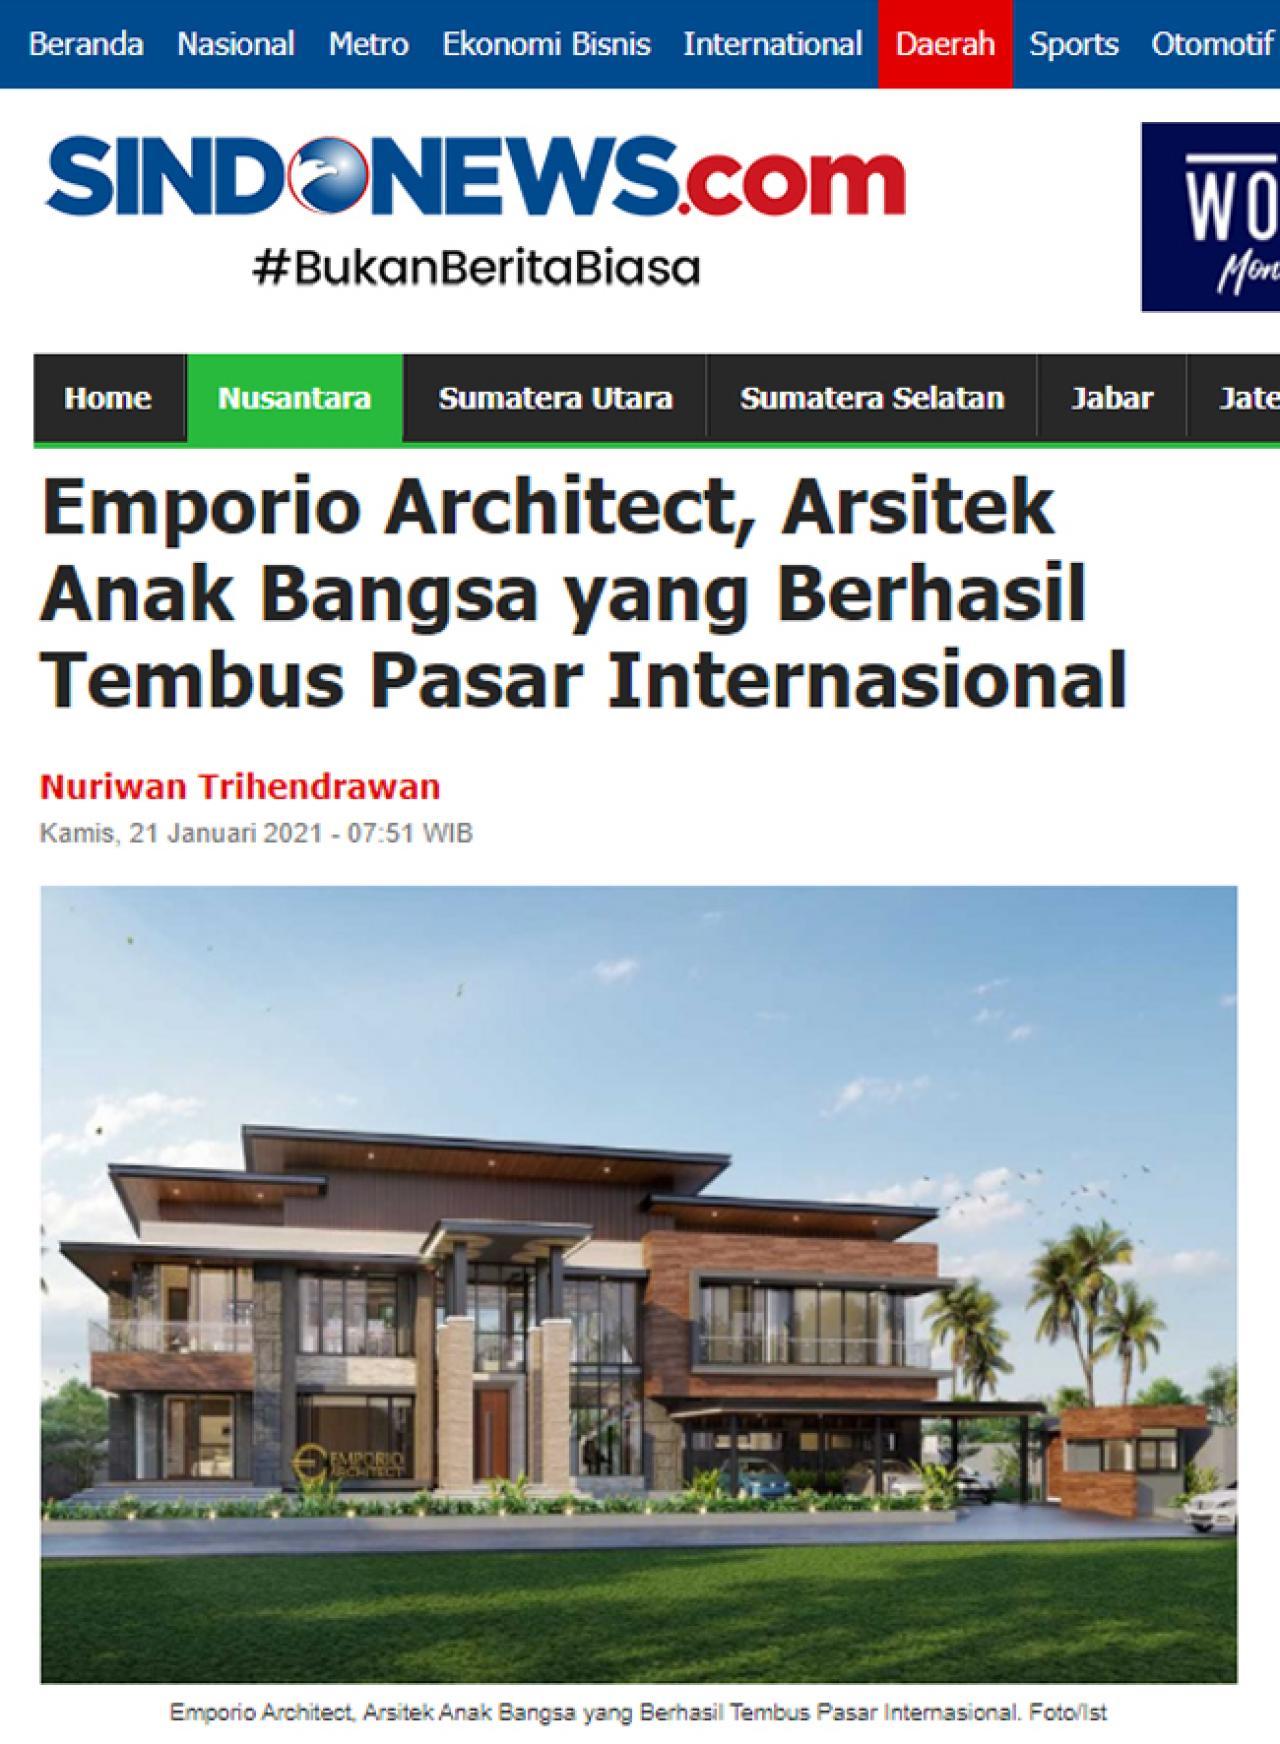 Ulasan Media SINDONEWS.com - Emporio Architect, Arsitek Anak Bangsa yang Berhasil Tembus Pasar Internasional